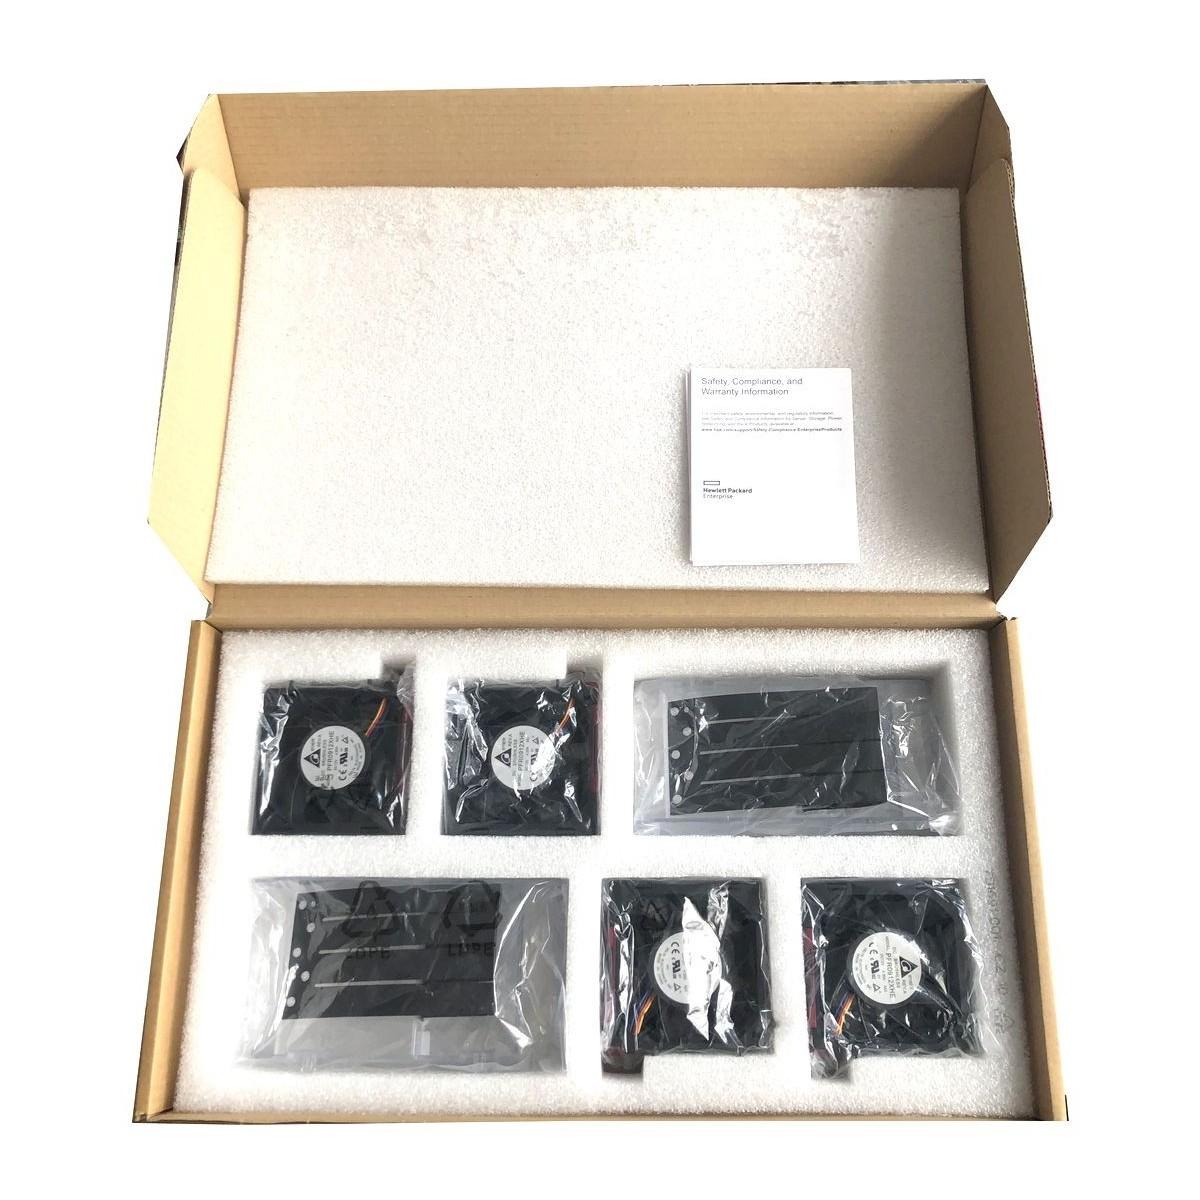 HP ML110 G7 3.10 i3-2100 4GB 2x250 B110i ILO3